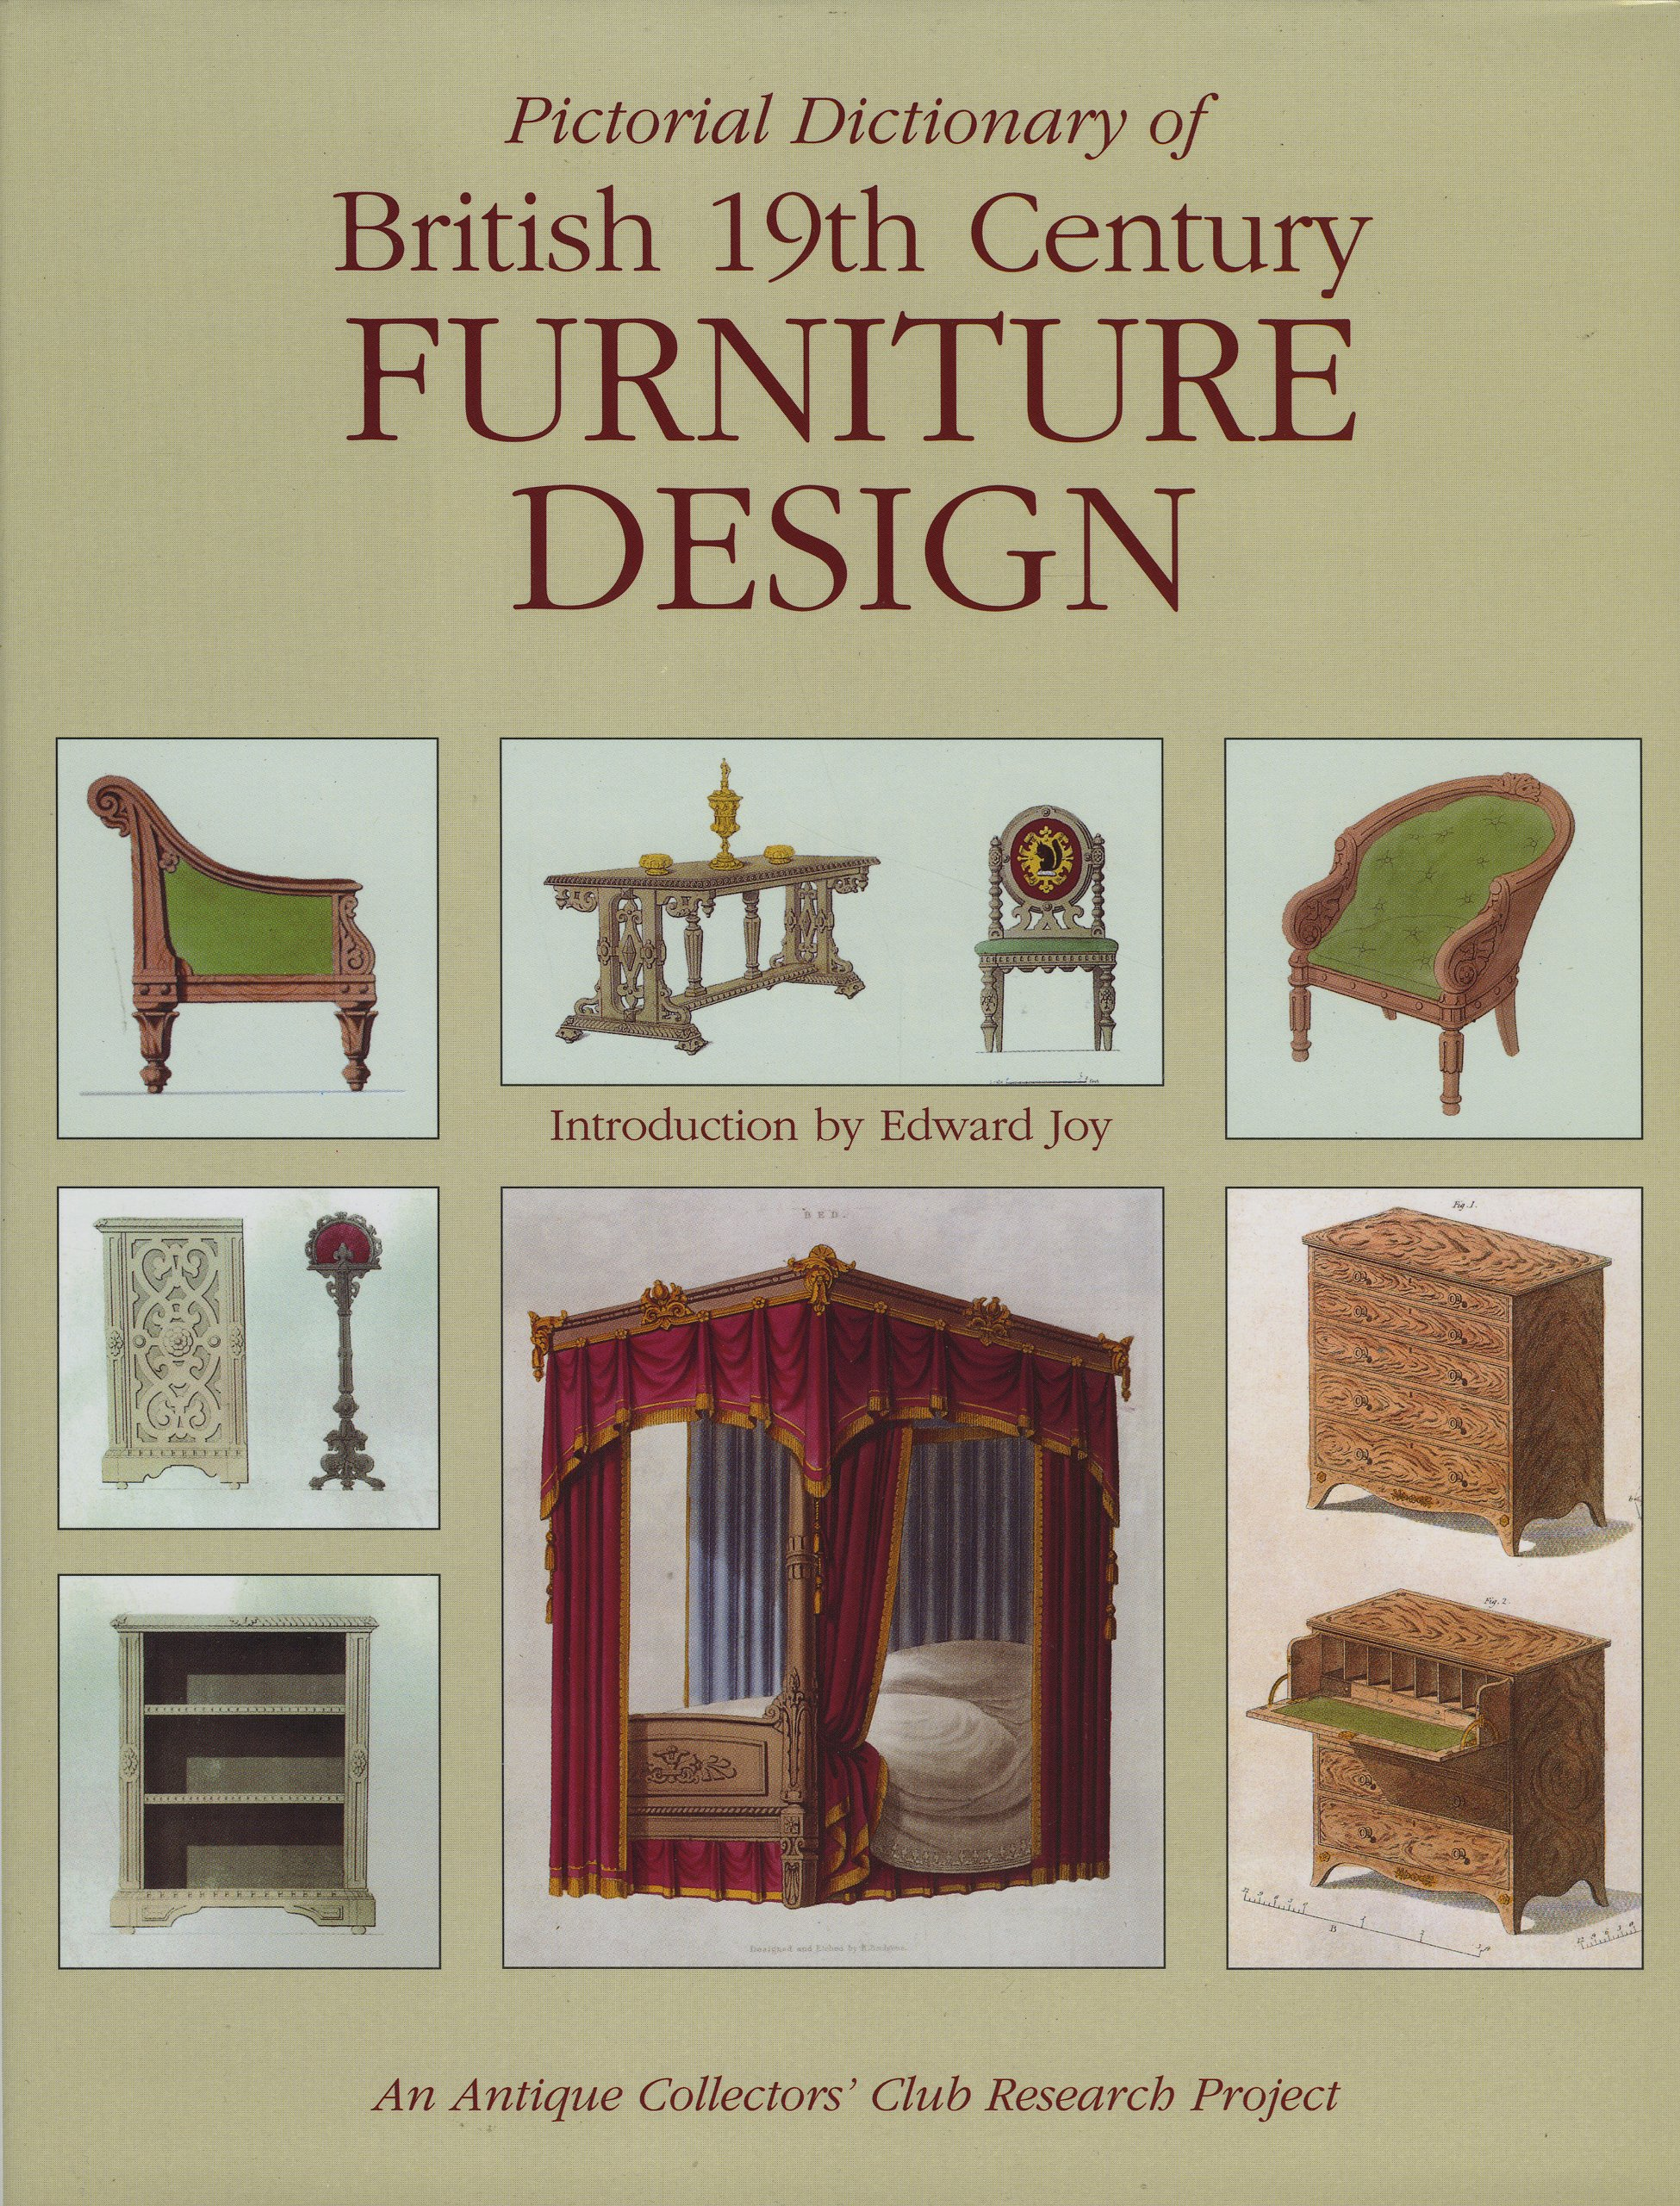 Superbe Pictorial Dictionary Of British 19th Century Furniture Design: Edward Joy:  9780902028470: Amazon.com: Books